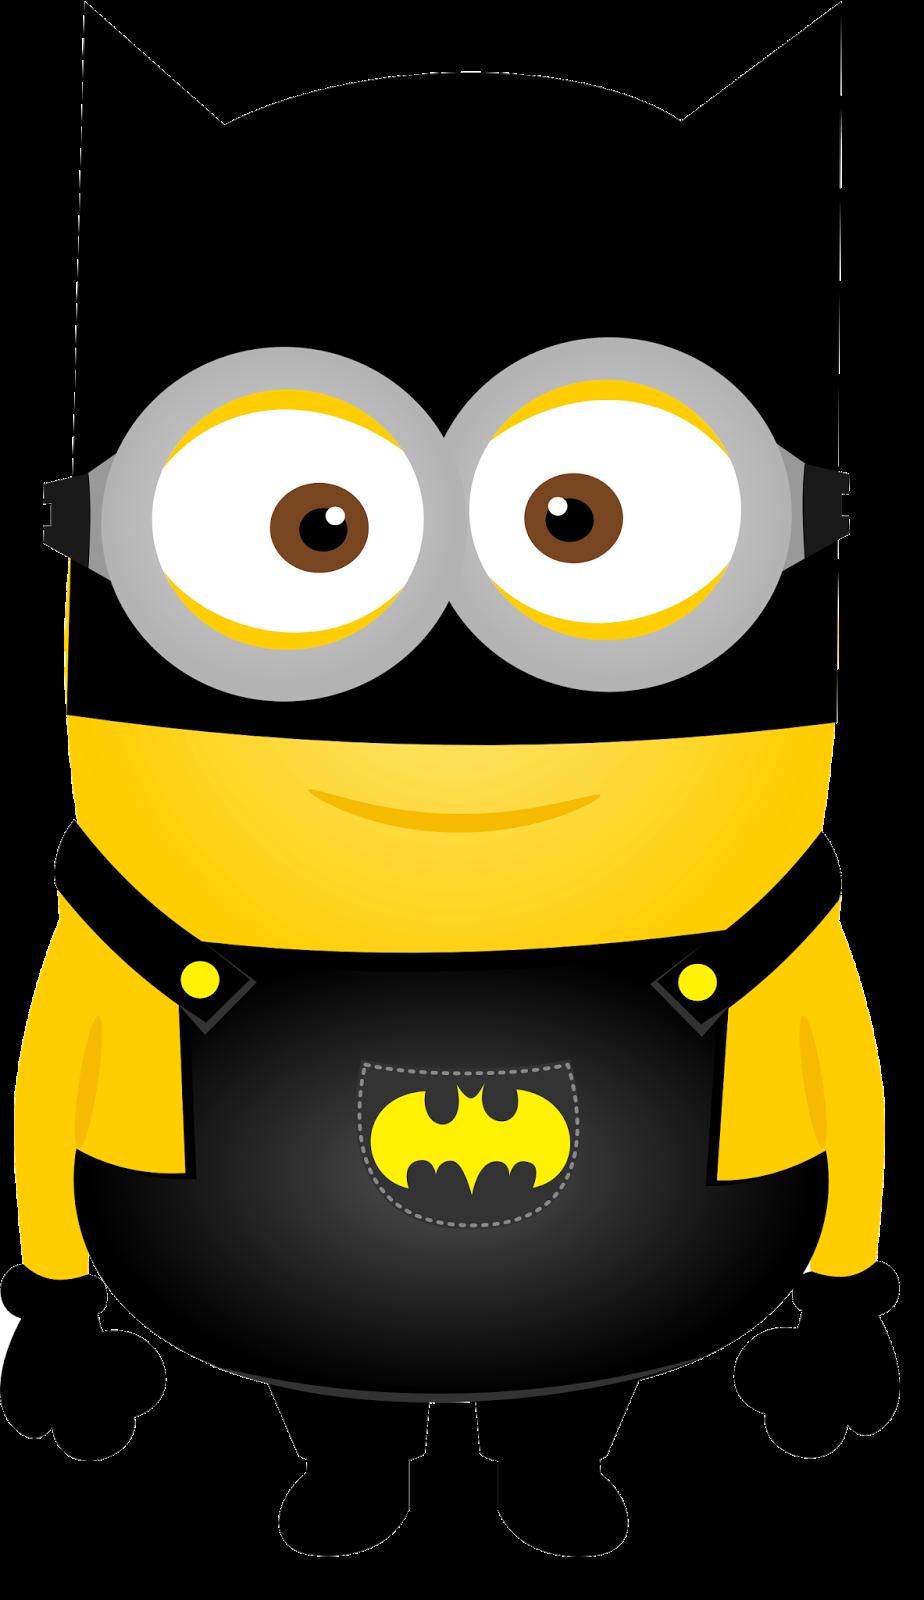 Minion clipart black and white. Minions superheroes clip art